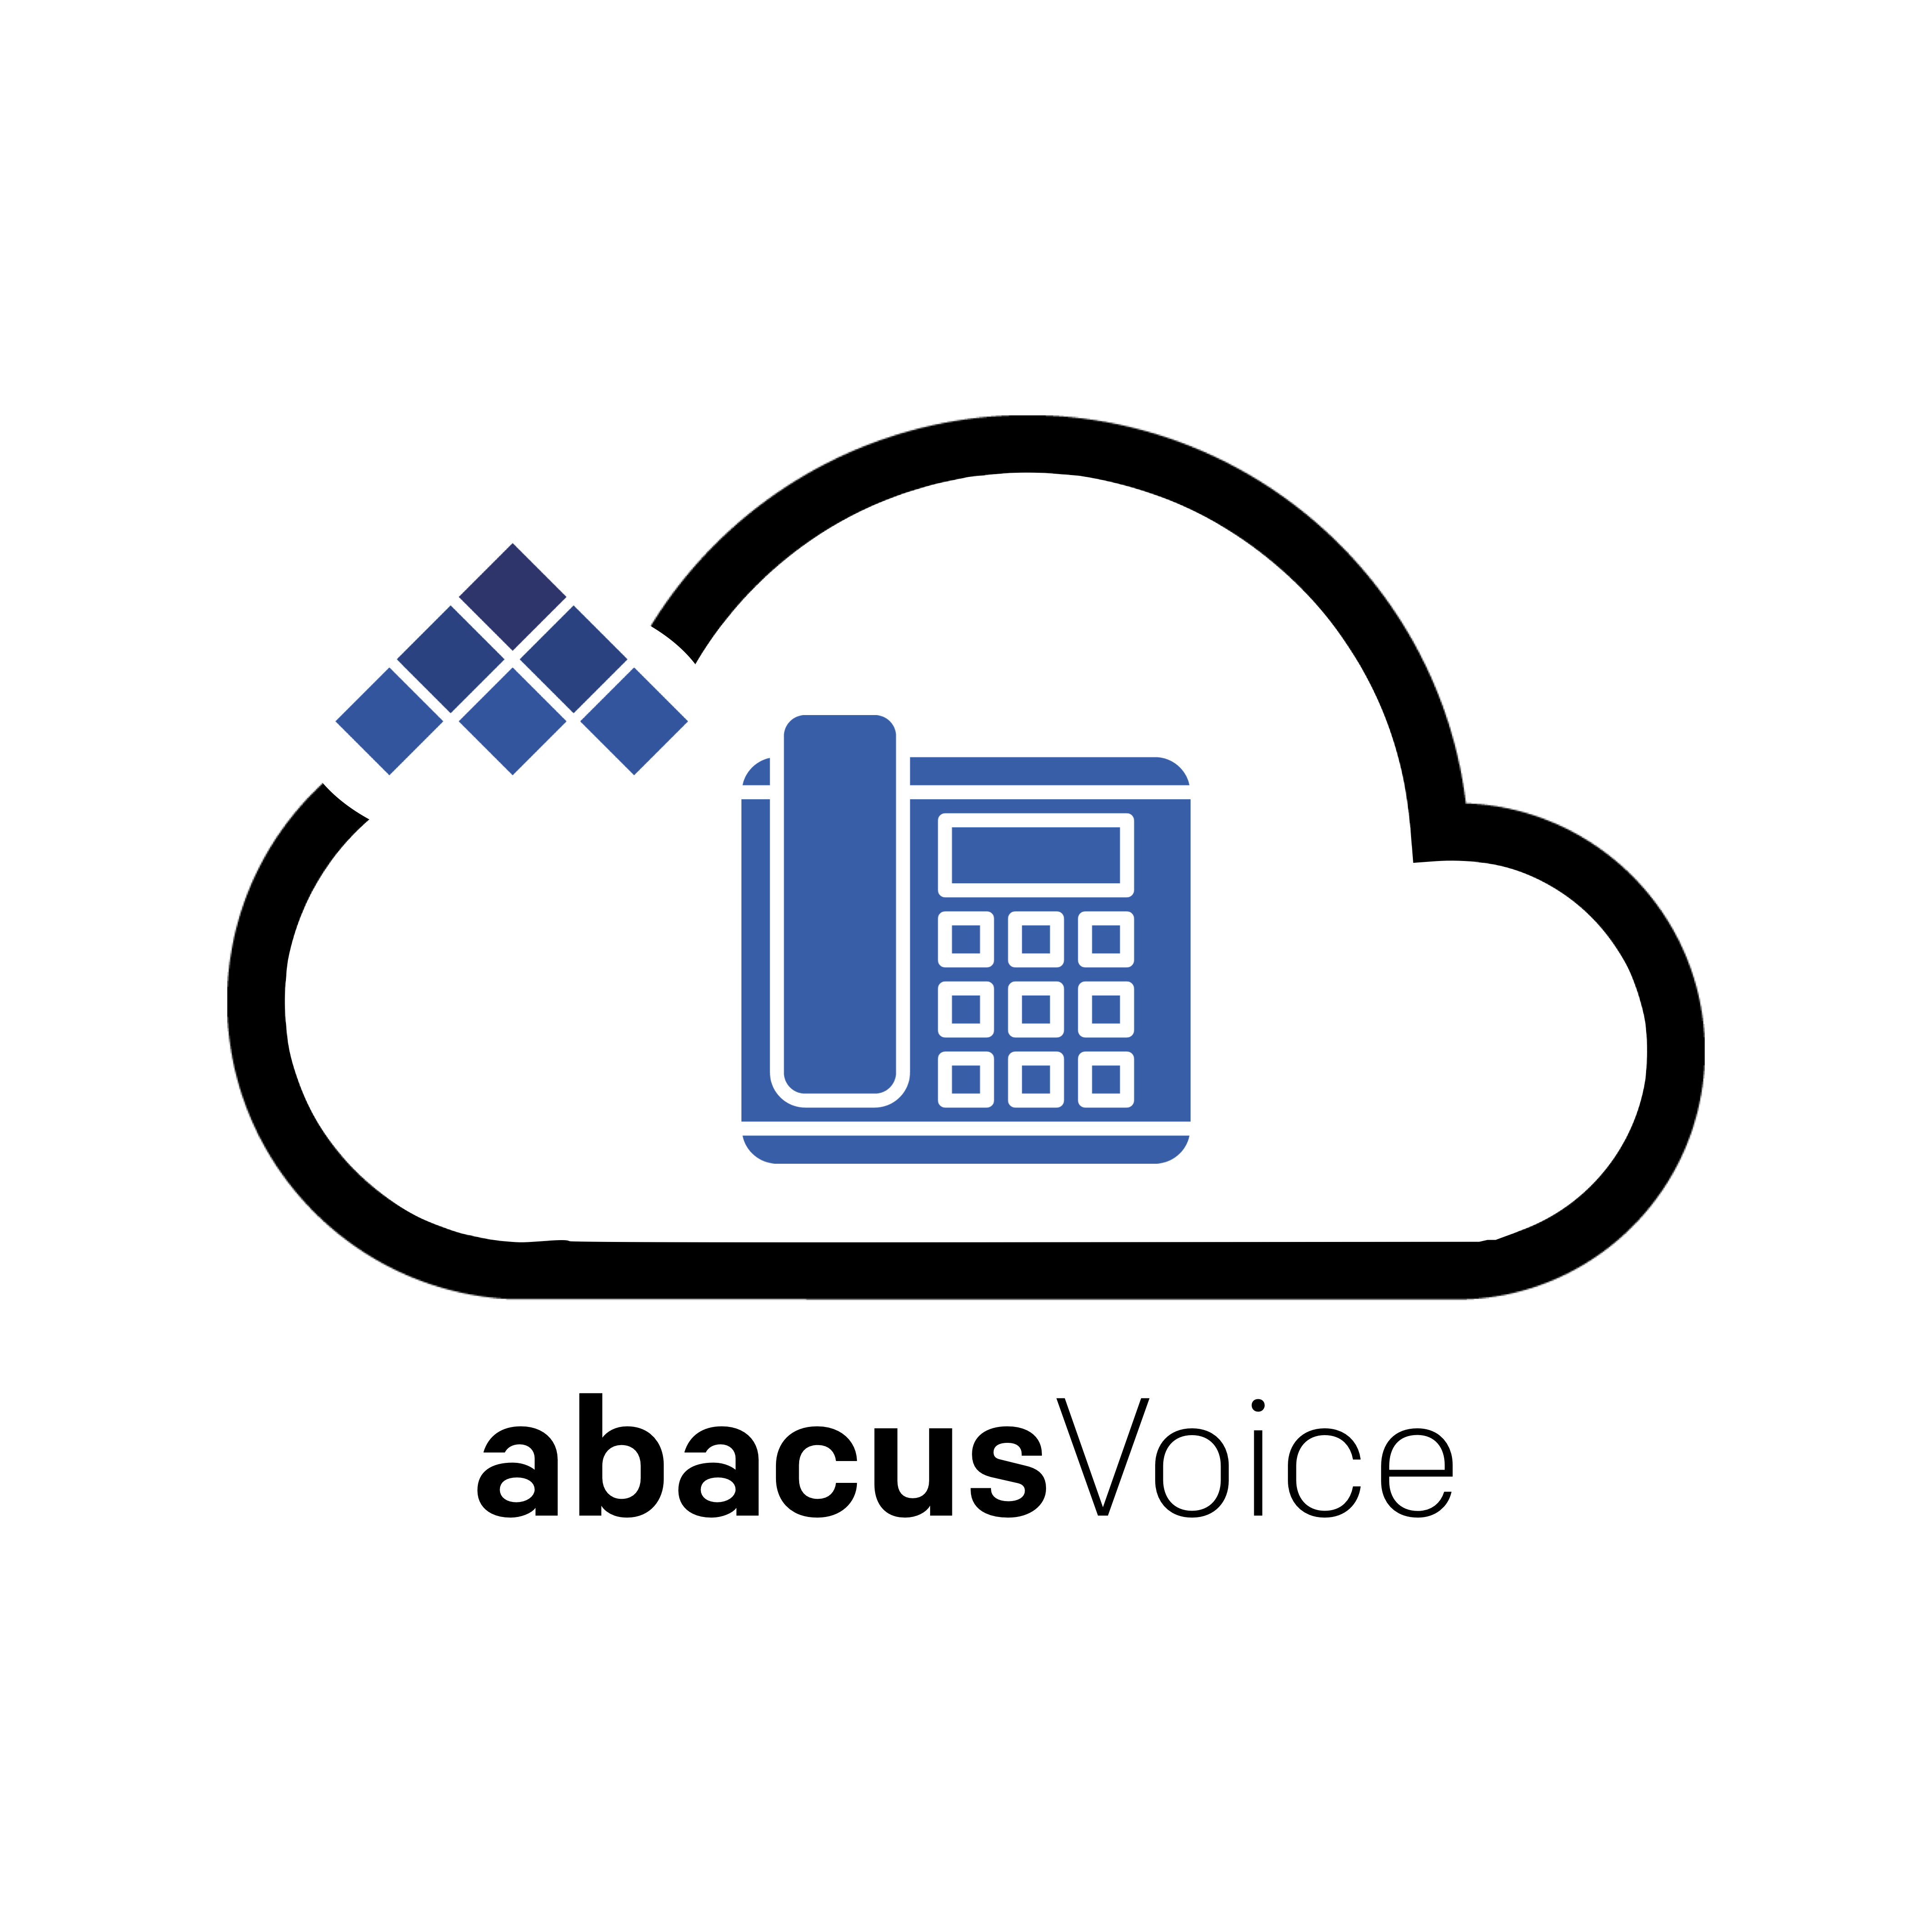 abacusVoice